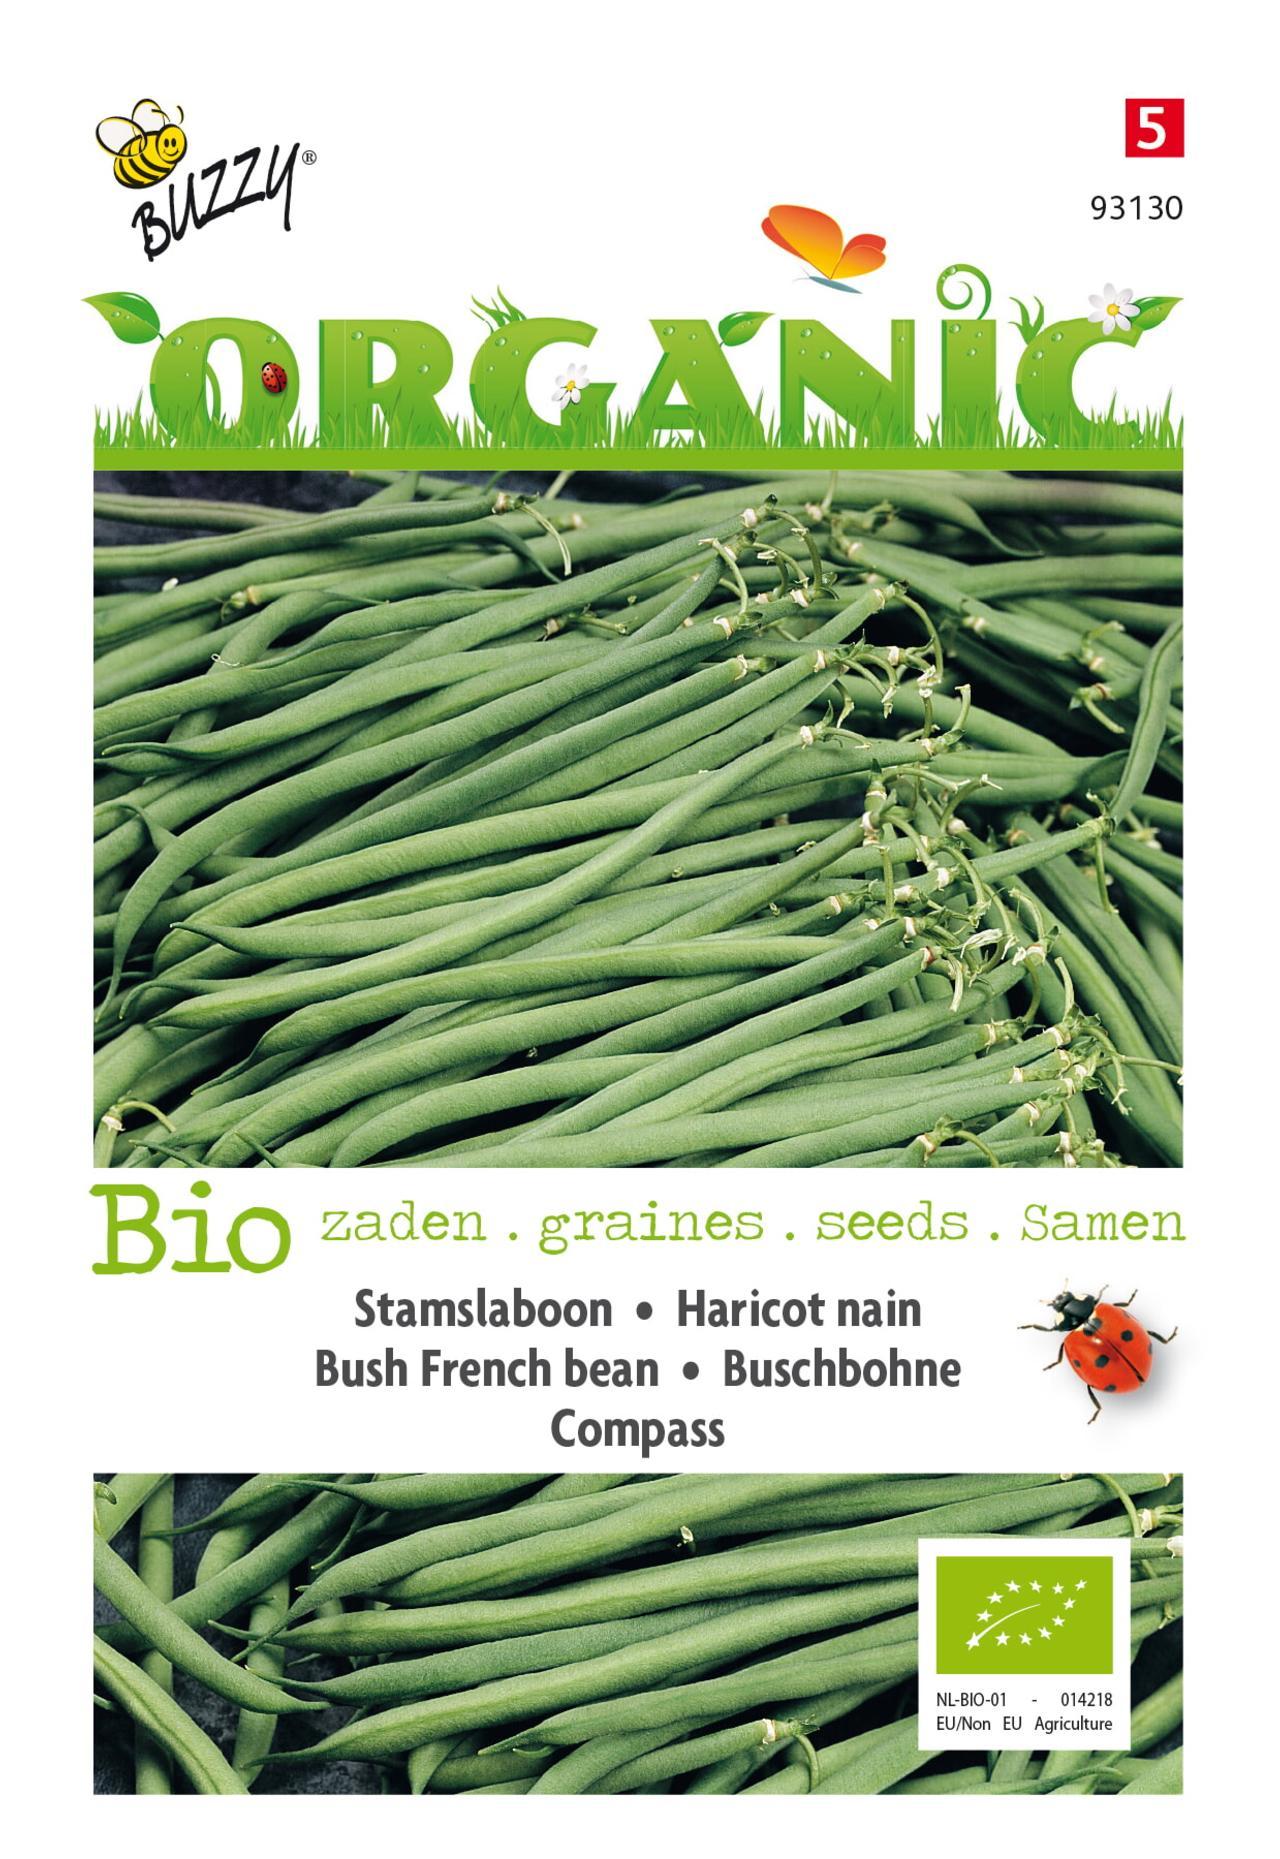 Phaseolus vulgaris 'Compass' (BIO) plant